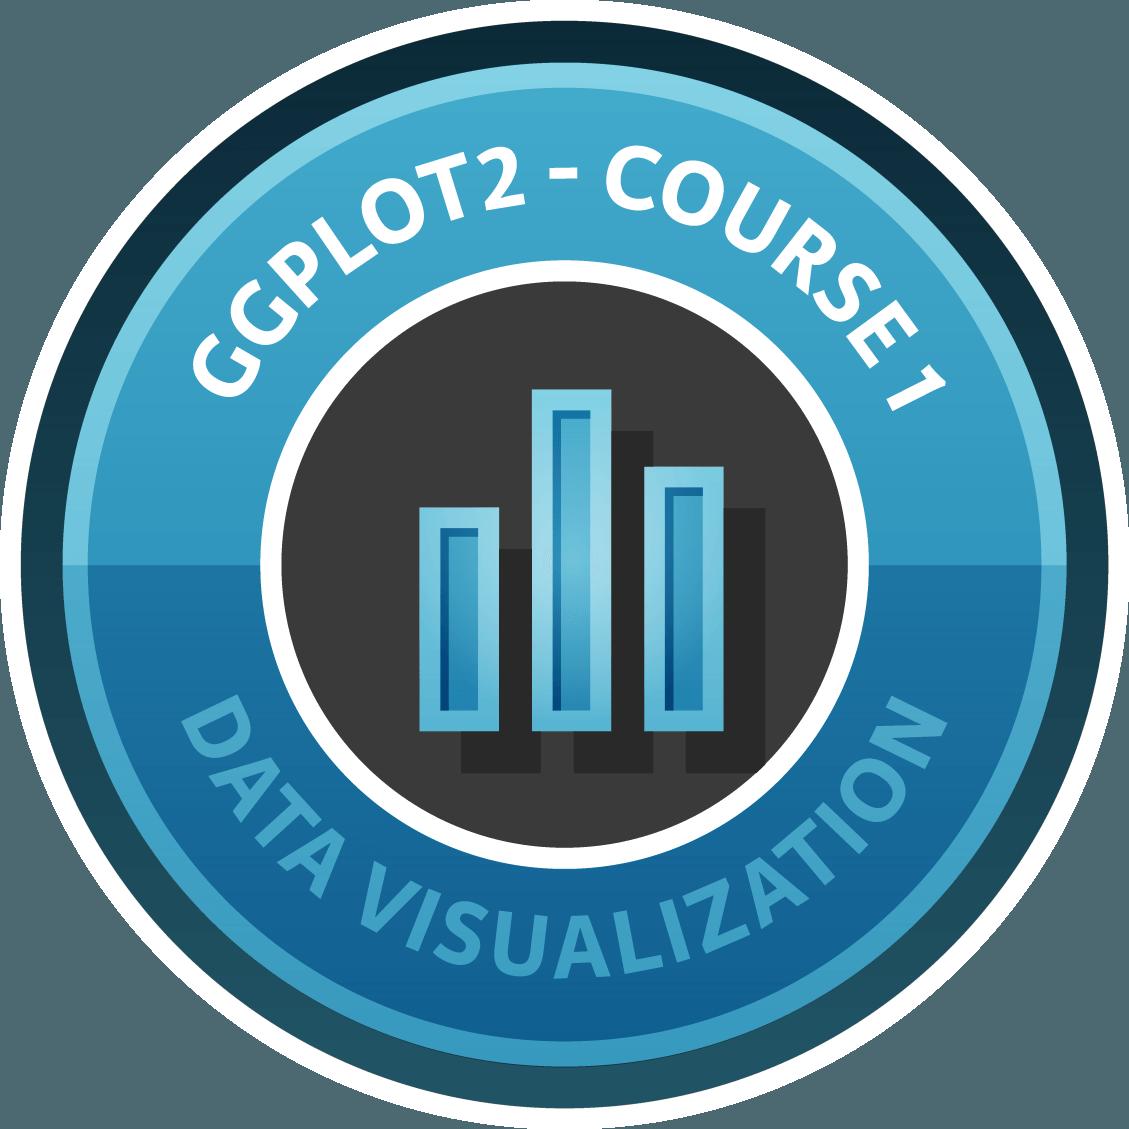 Data Visualization with ggplot2 (1)